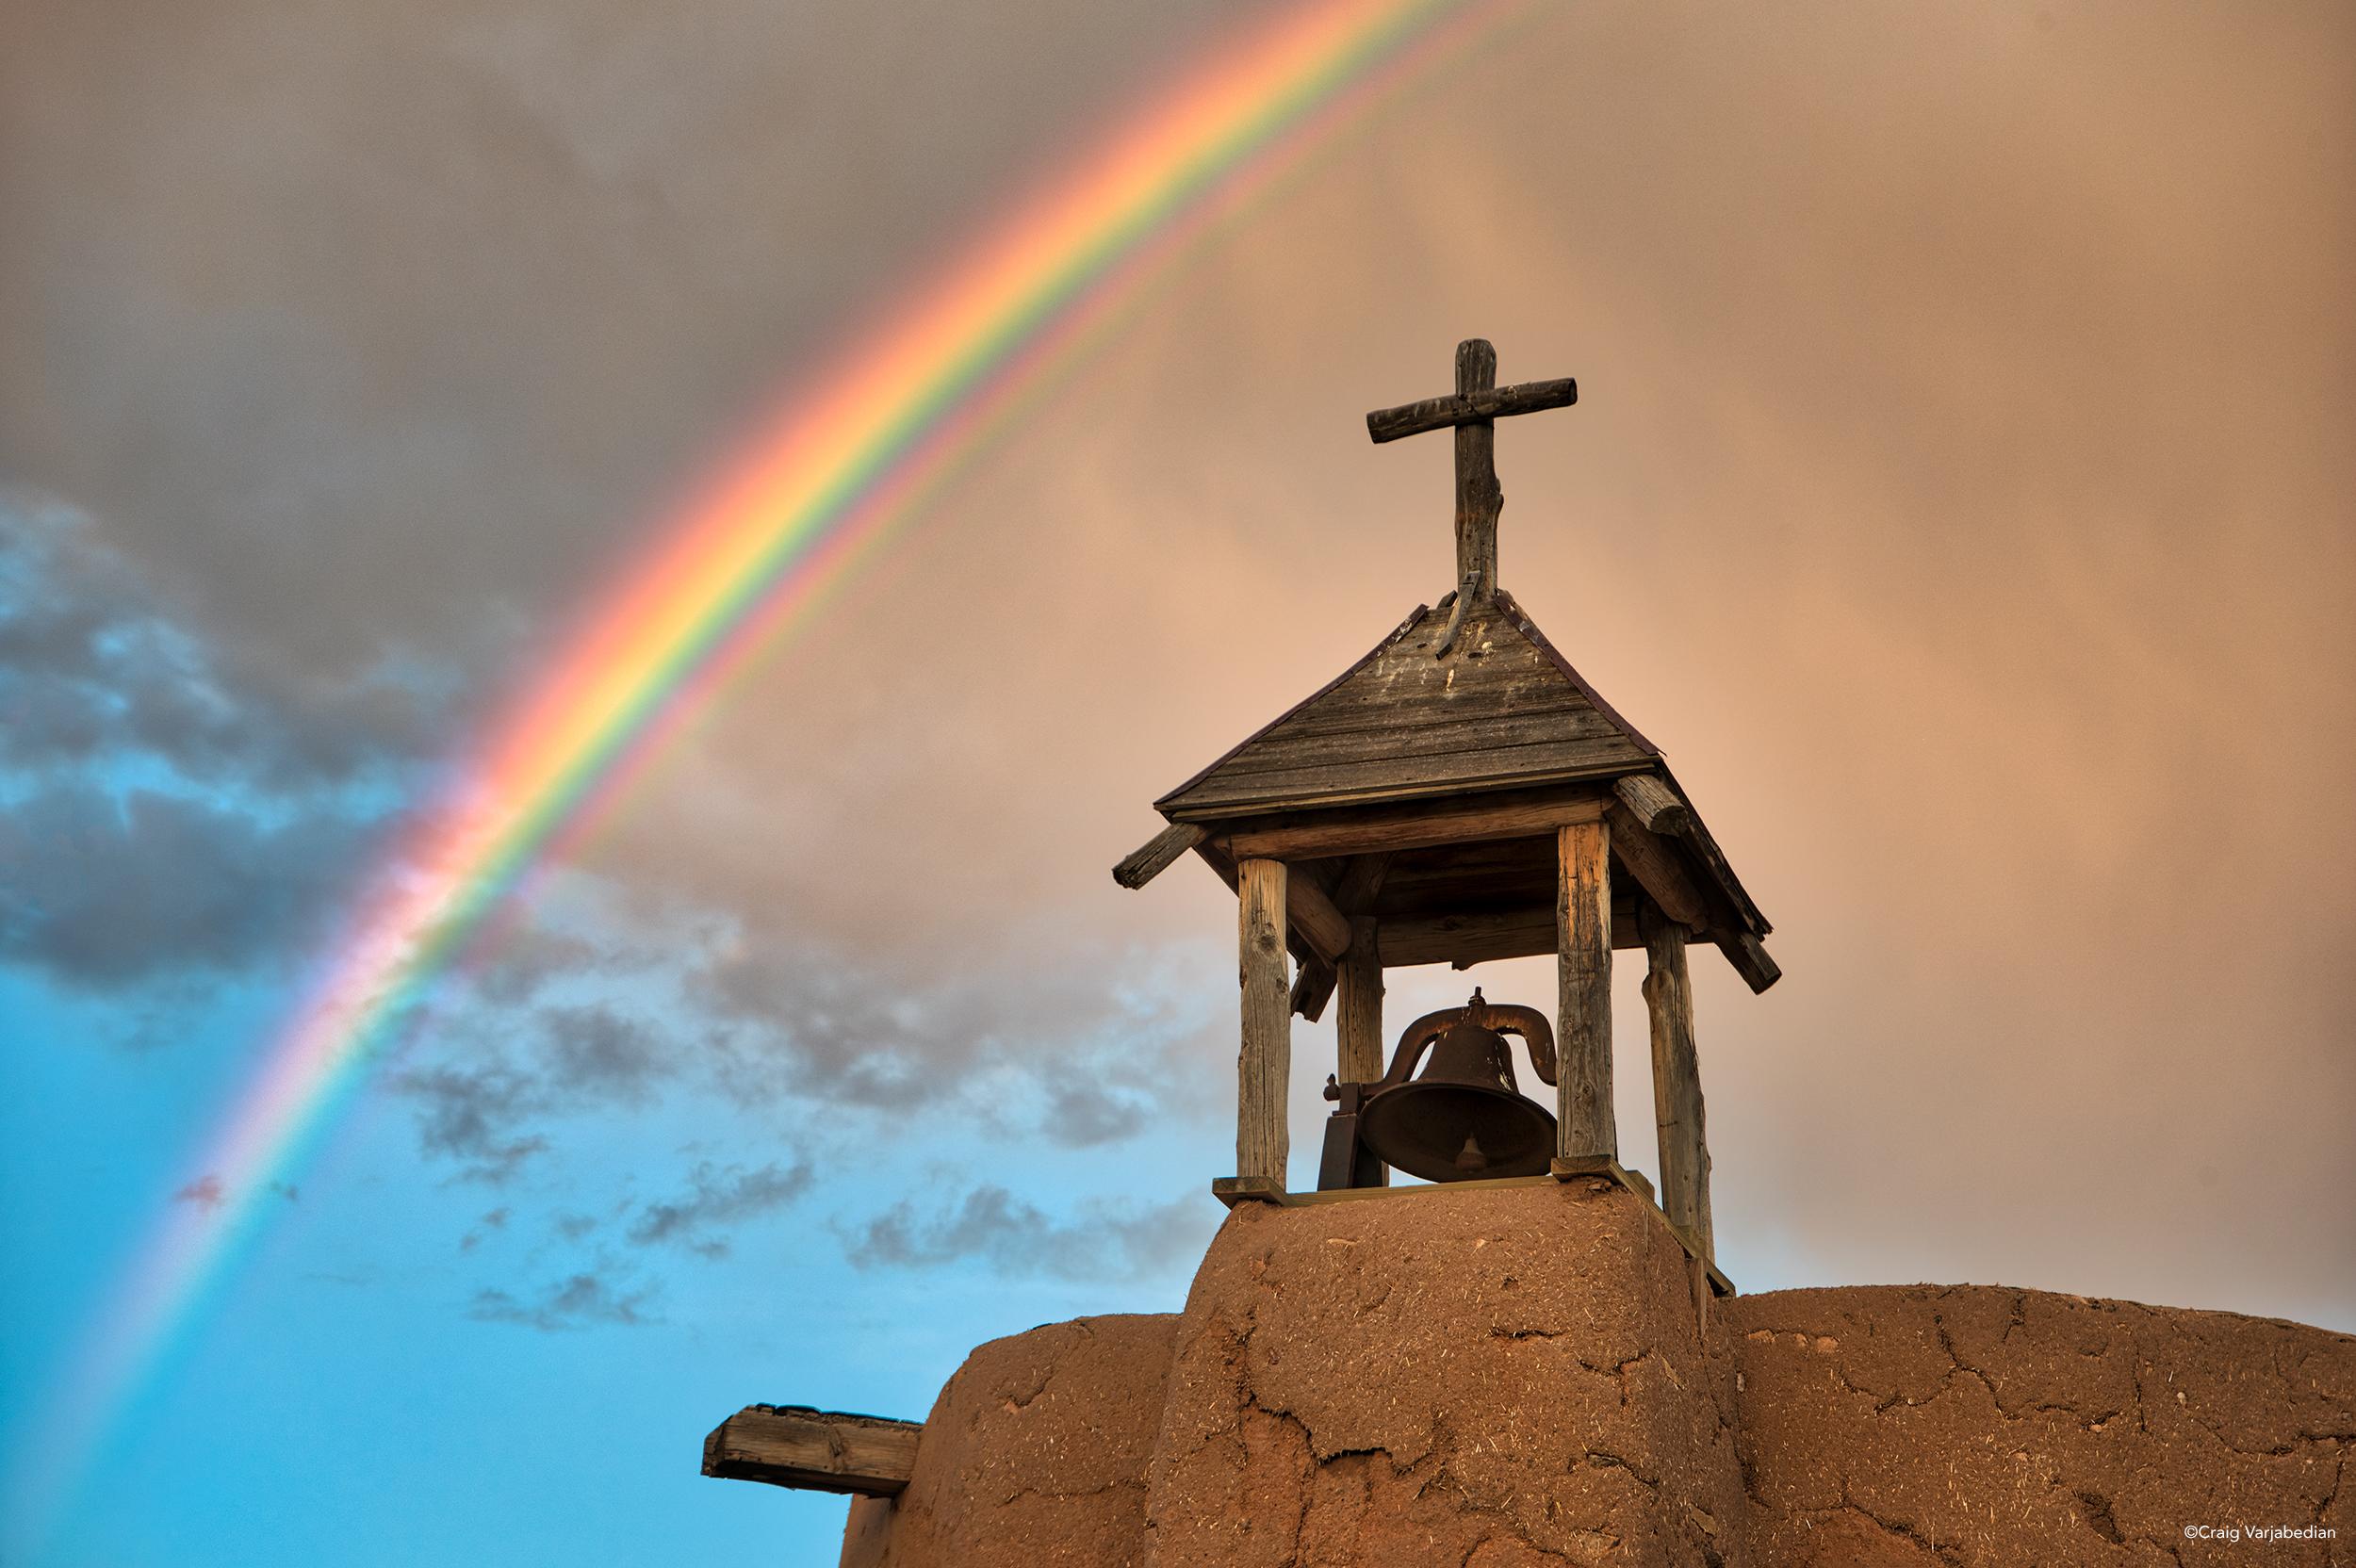 Morada_Rainbow_DSC2120_FINISH.jpg